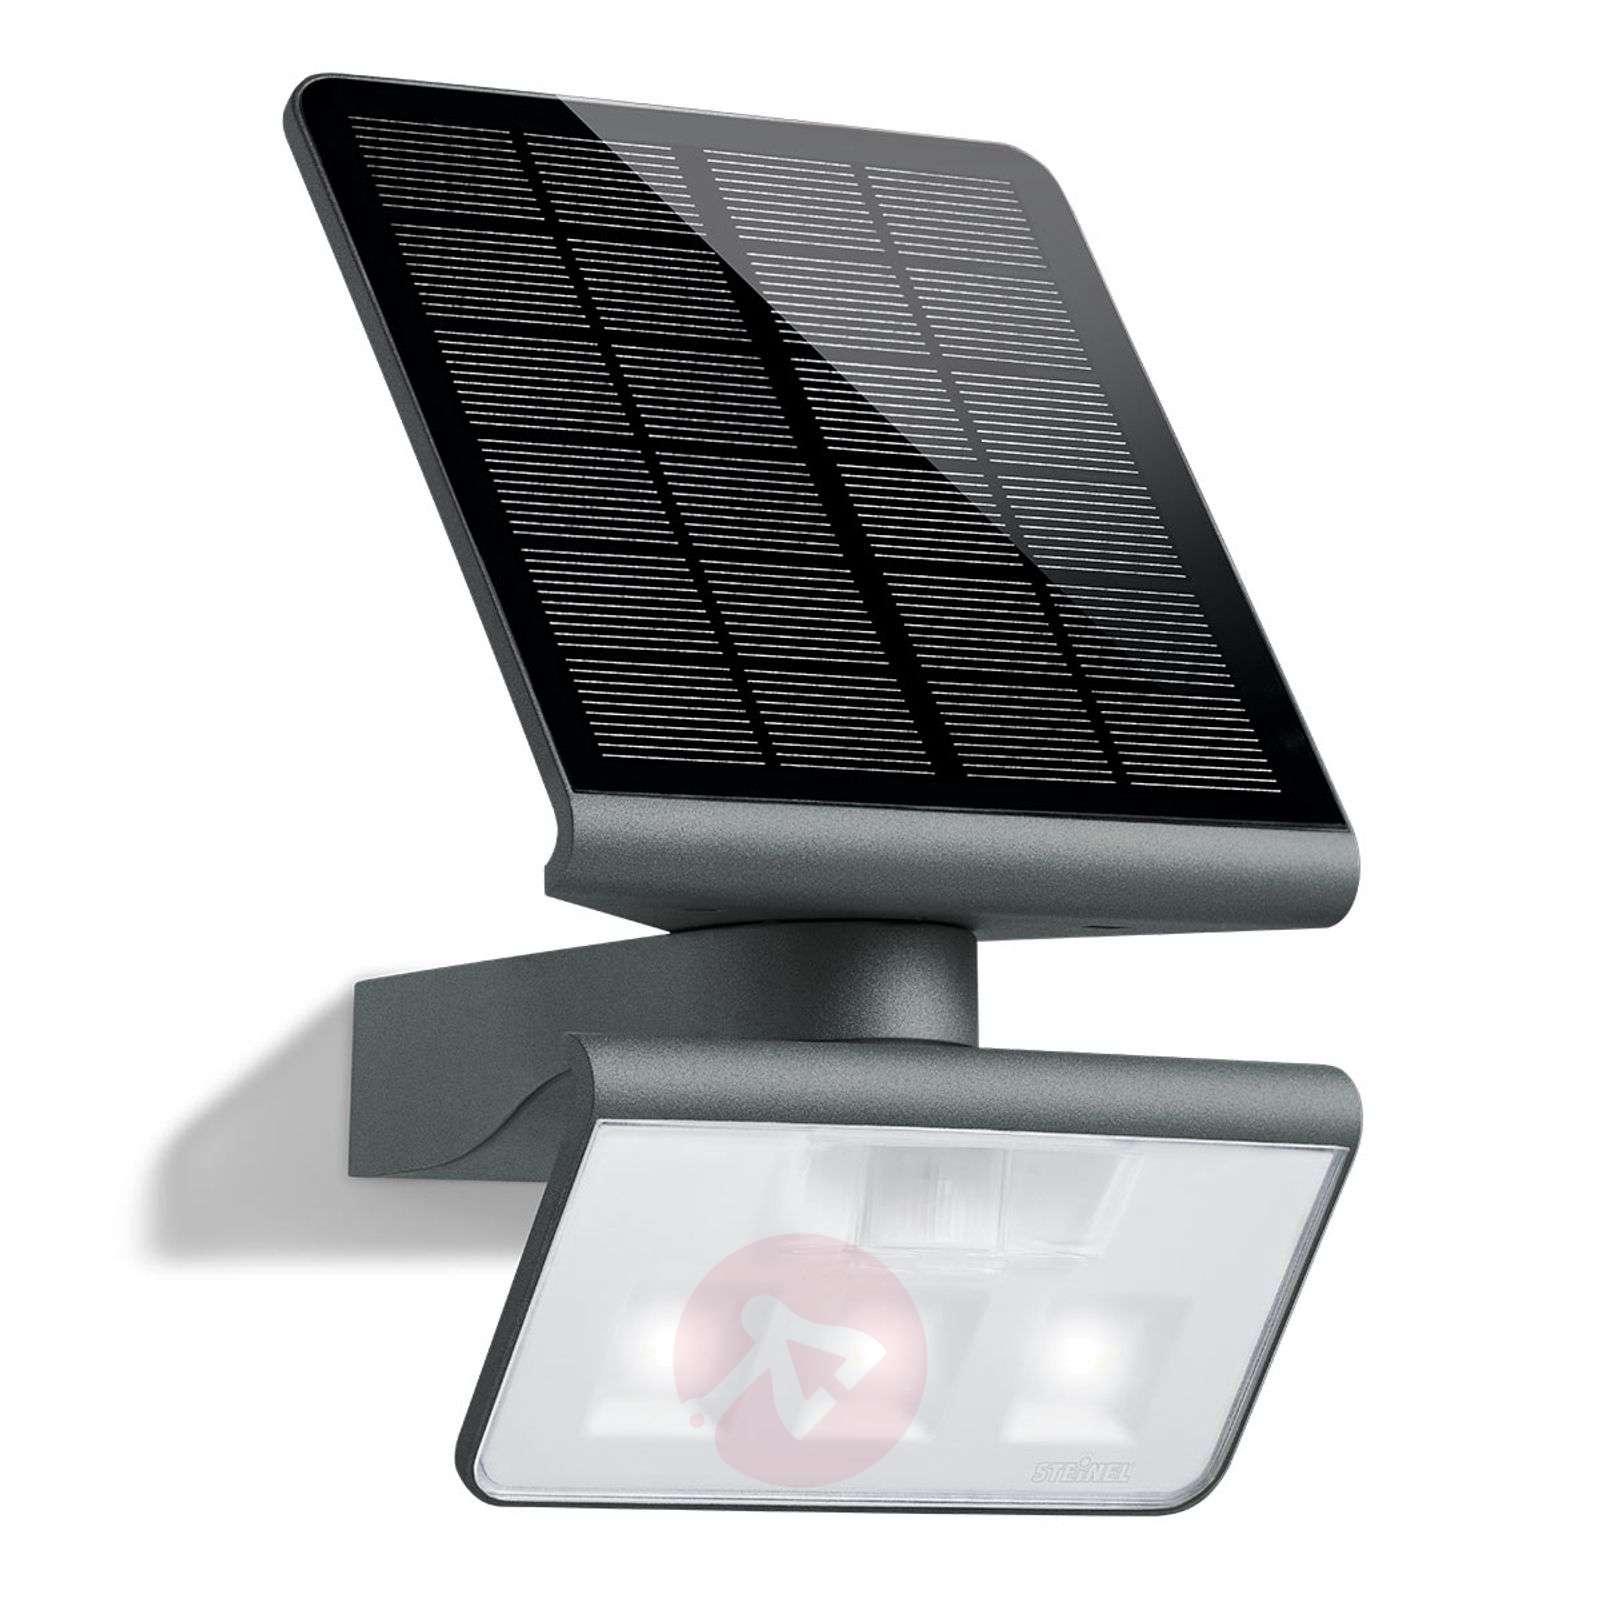 STEINEL XSolar L-S Professional LED-kohdevalo tunn-8506055-01